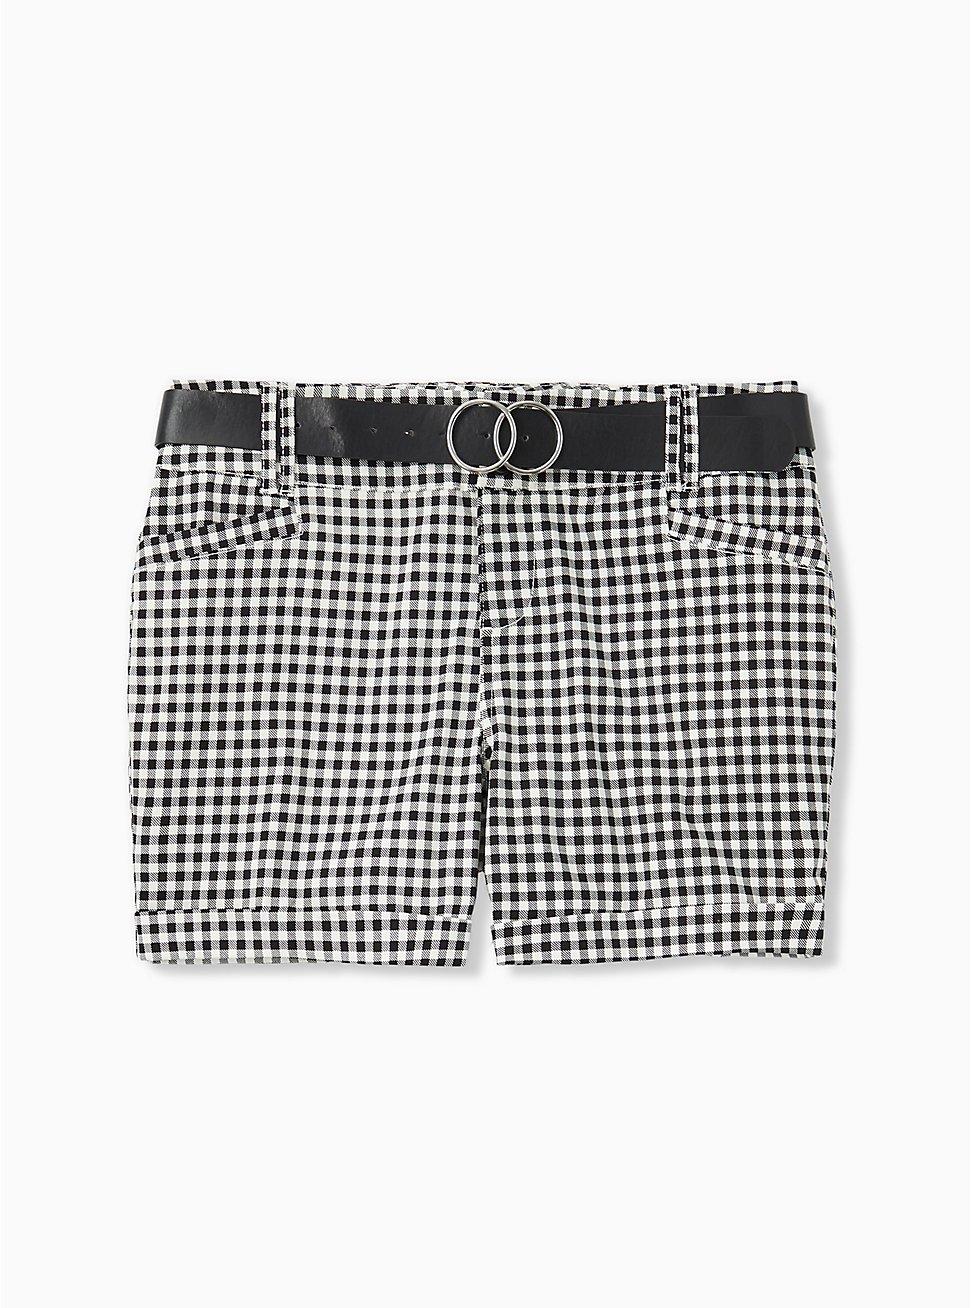 Plus Size Belted Mid Short - Sateen Gingham Black, GINGHAM WHITE-BLACK, hi-res